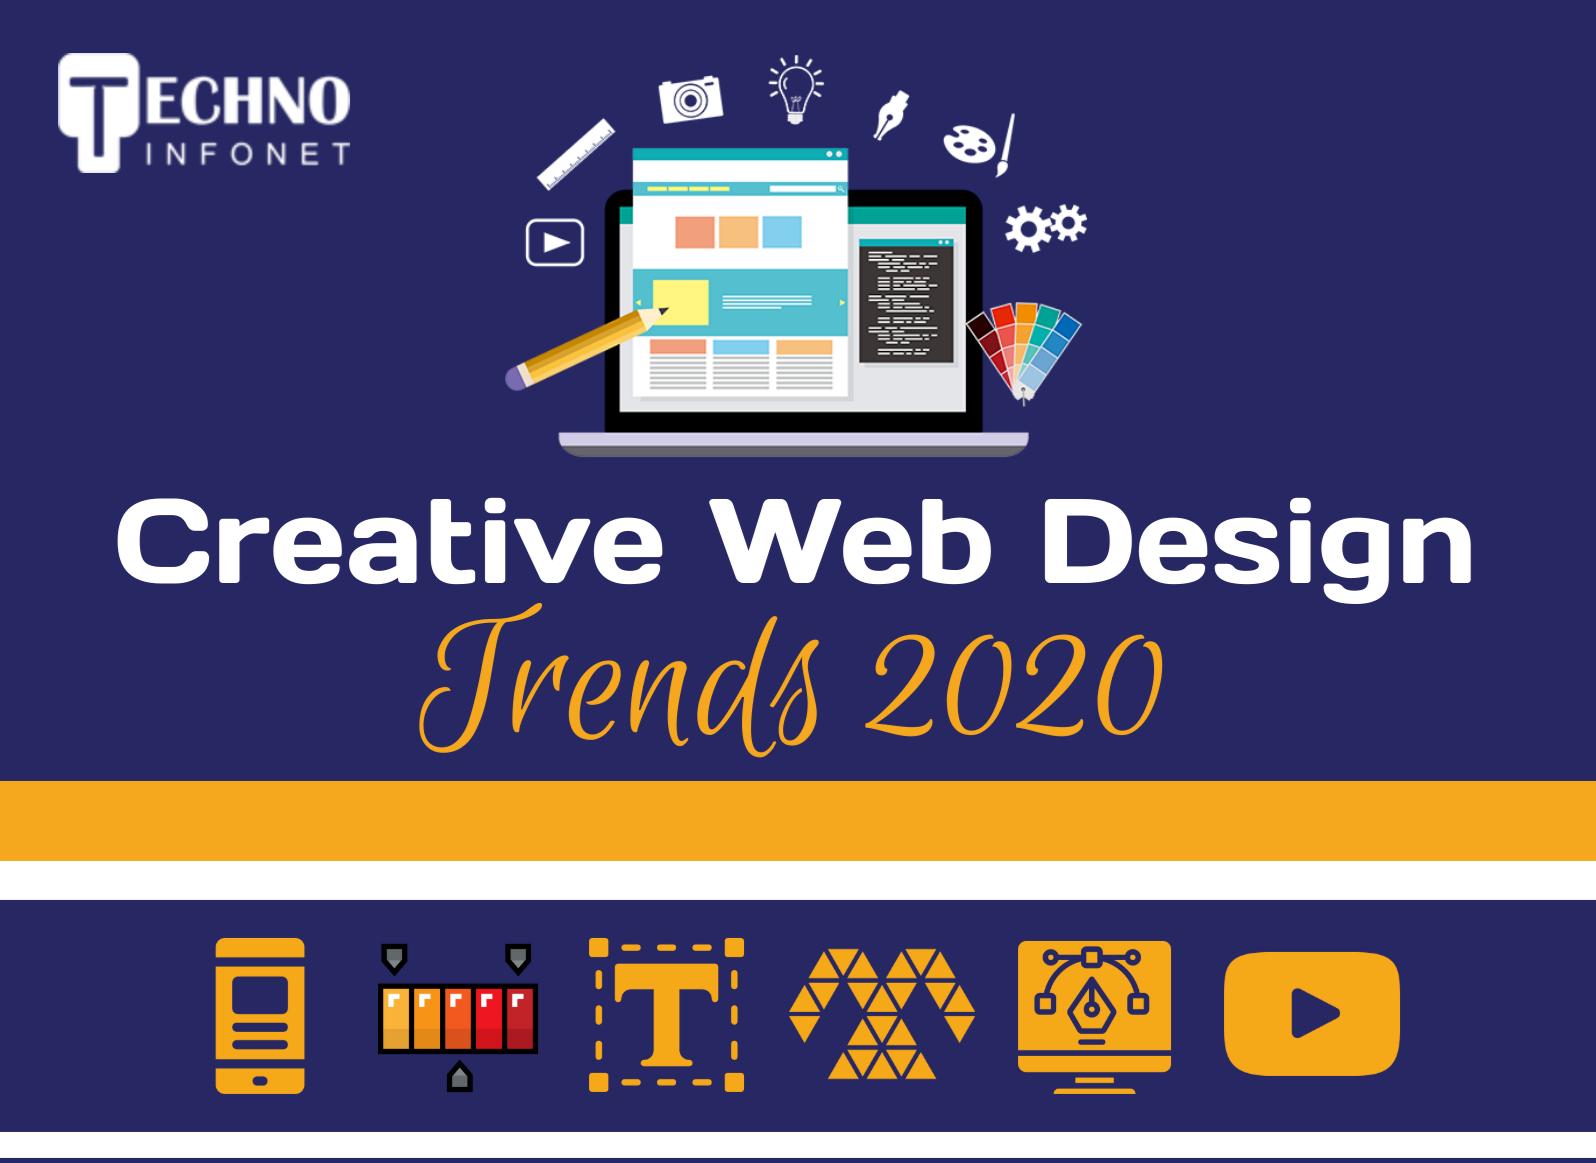 Creative Web Design Trends 2020